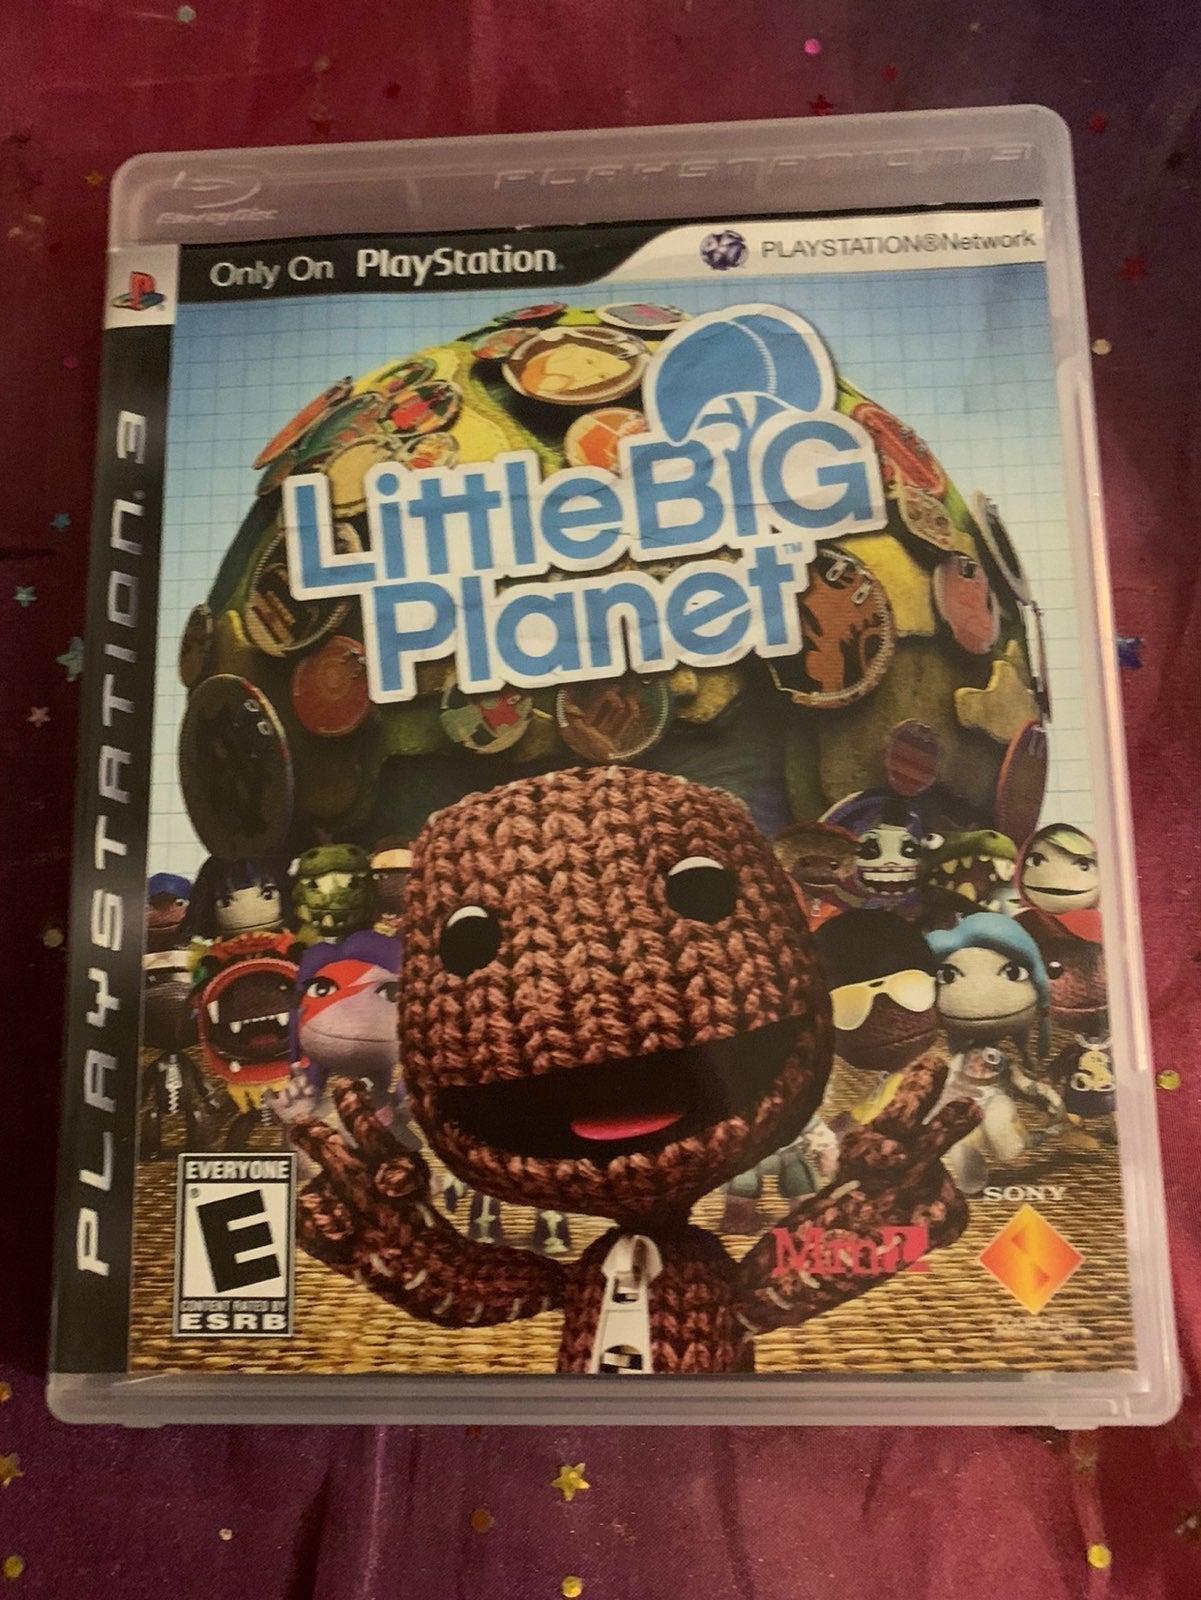 LittleBigPlanet on Playstation 3